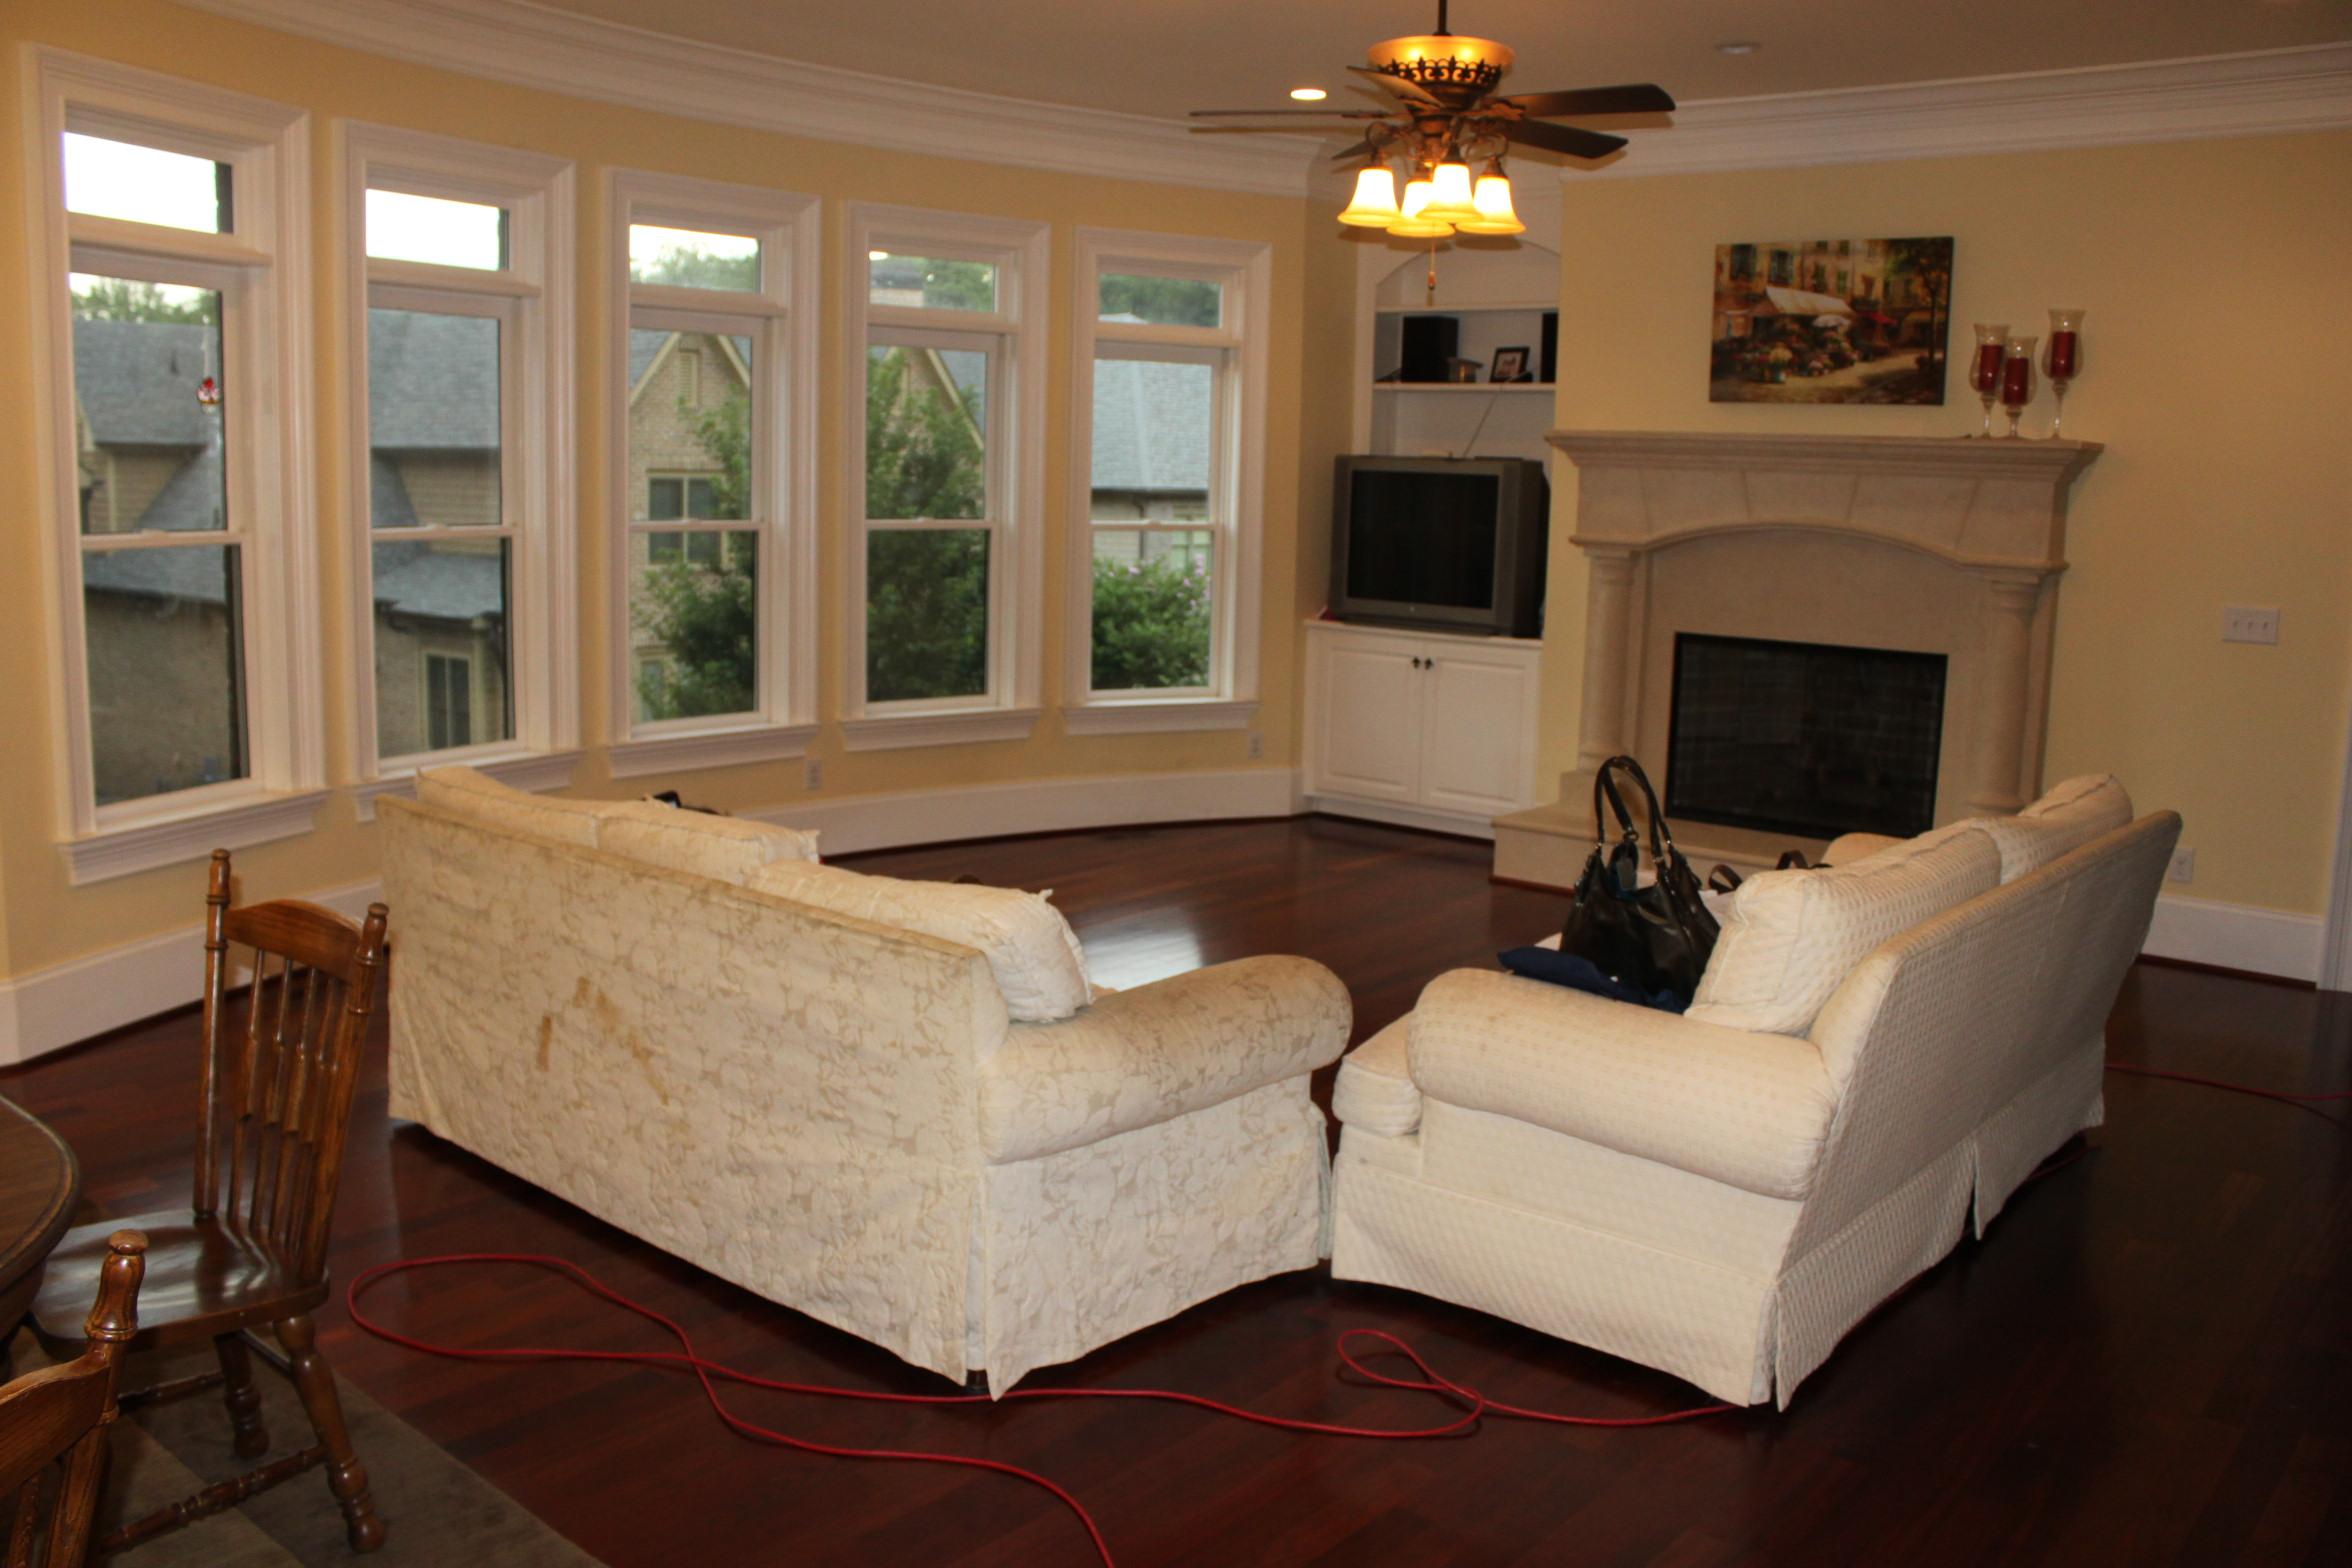 Furniture Layout Help Needed Img 2349 Jpg